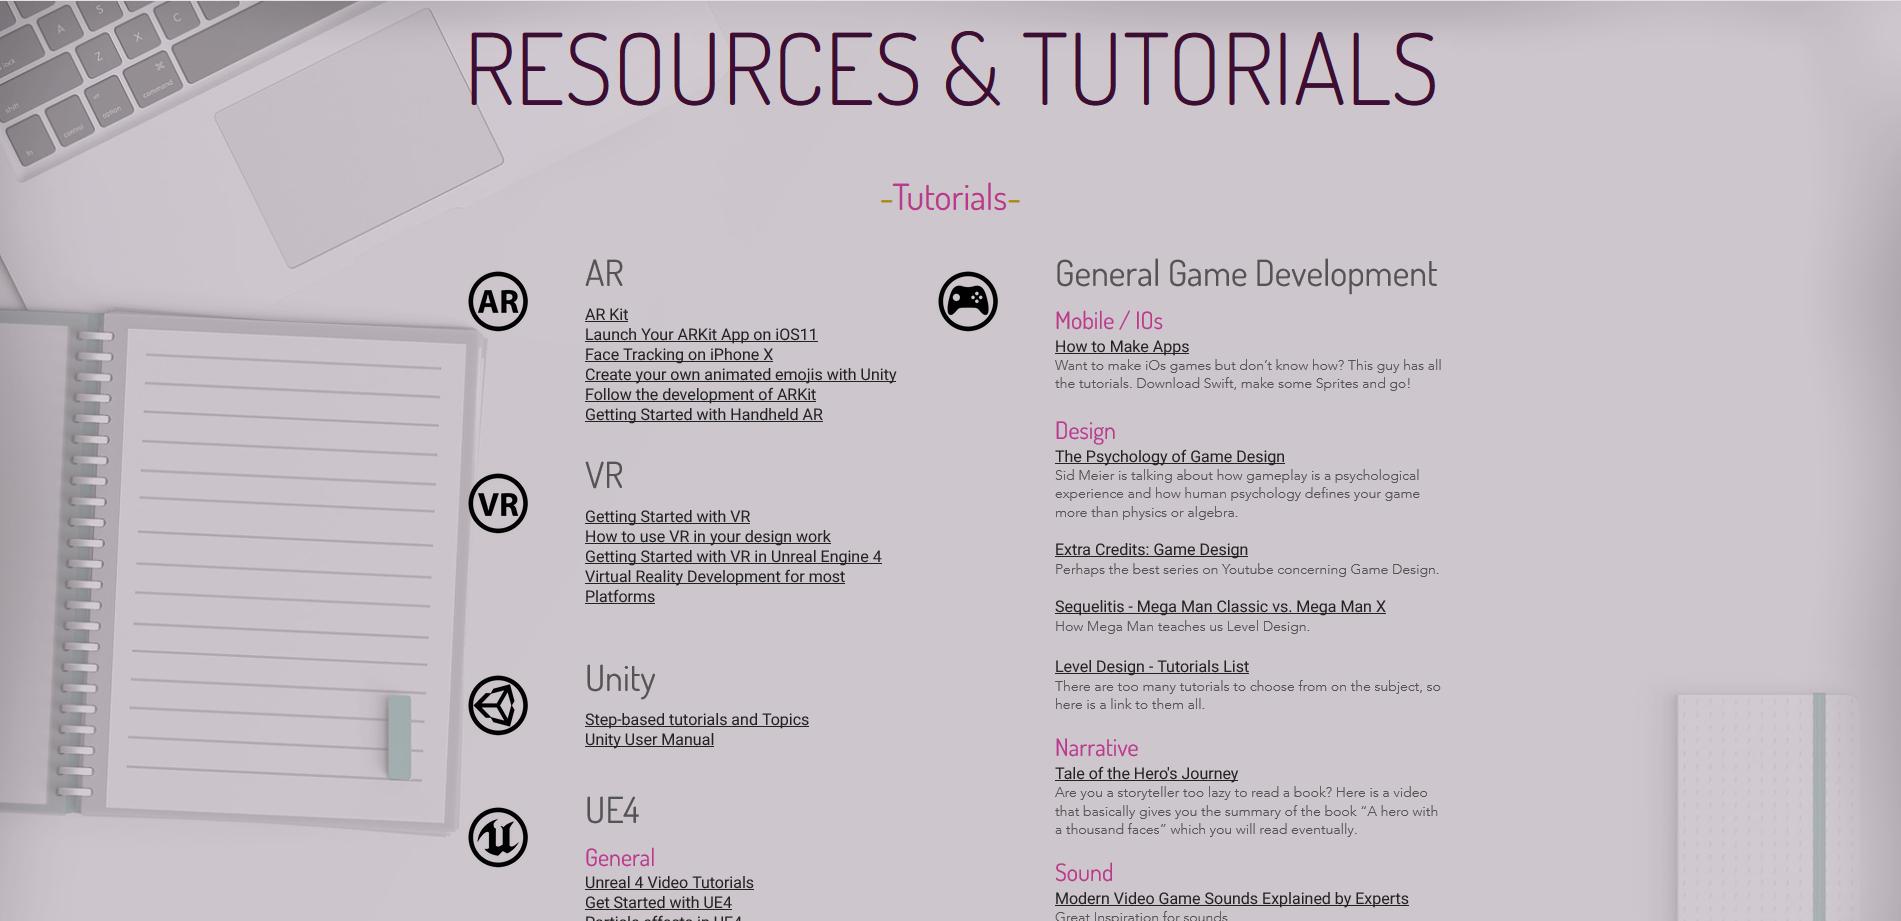 Resources & Tutorials